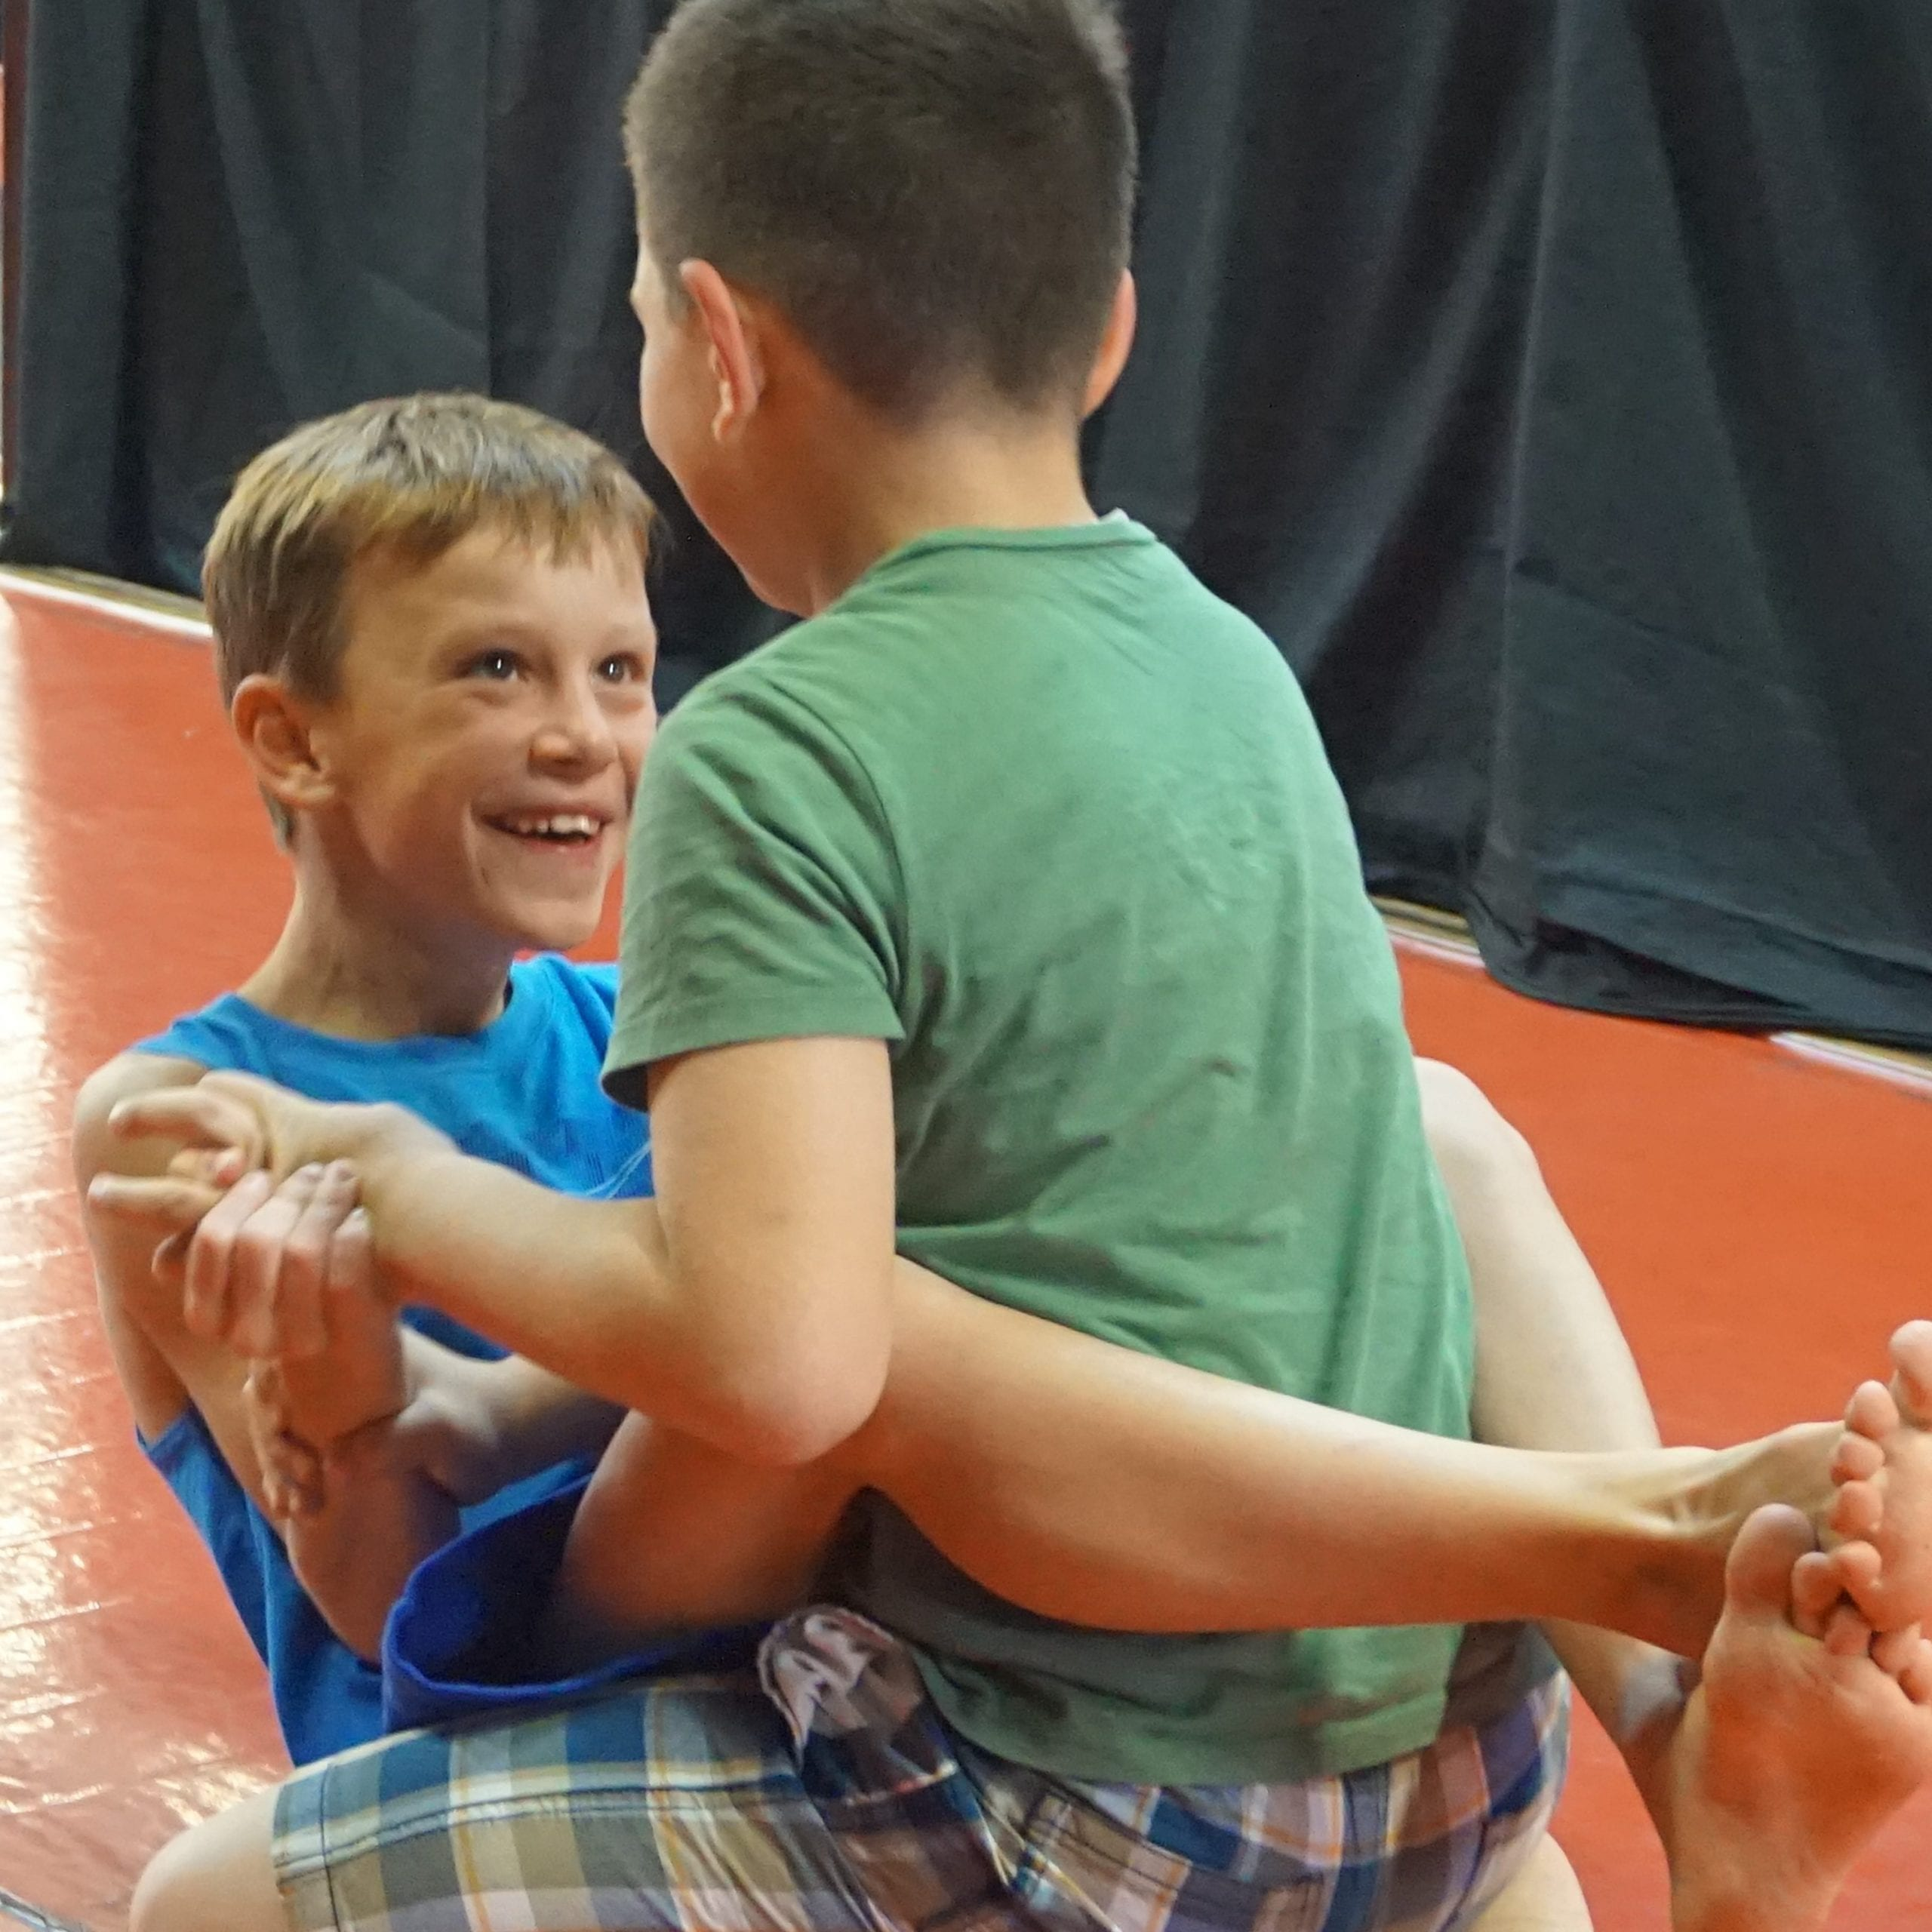 Martial Arts For Kids: Toronto Kids MMA Classes   Grants MMA